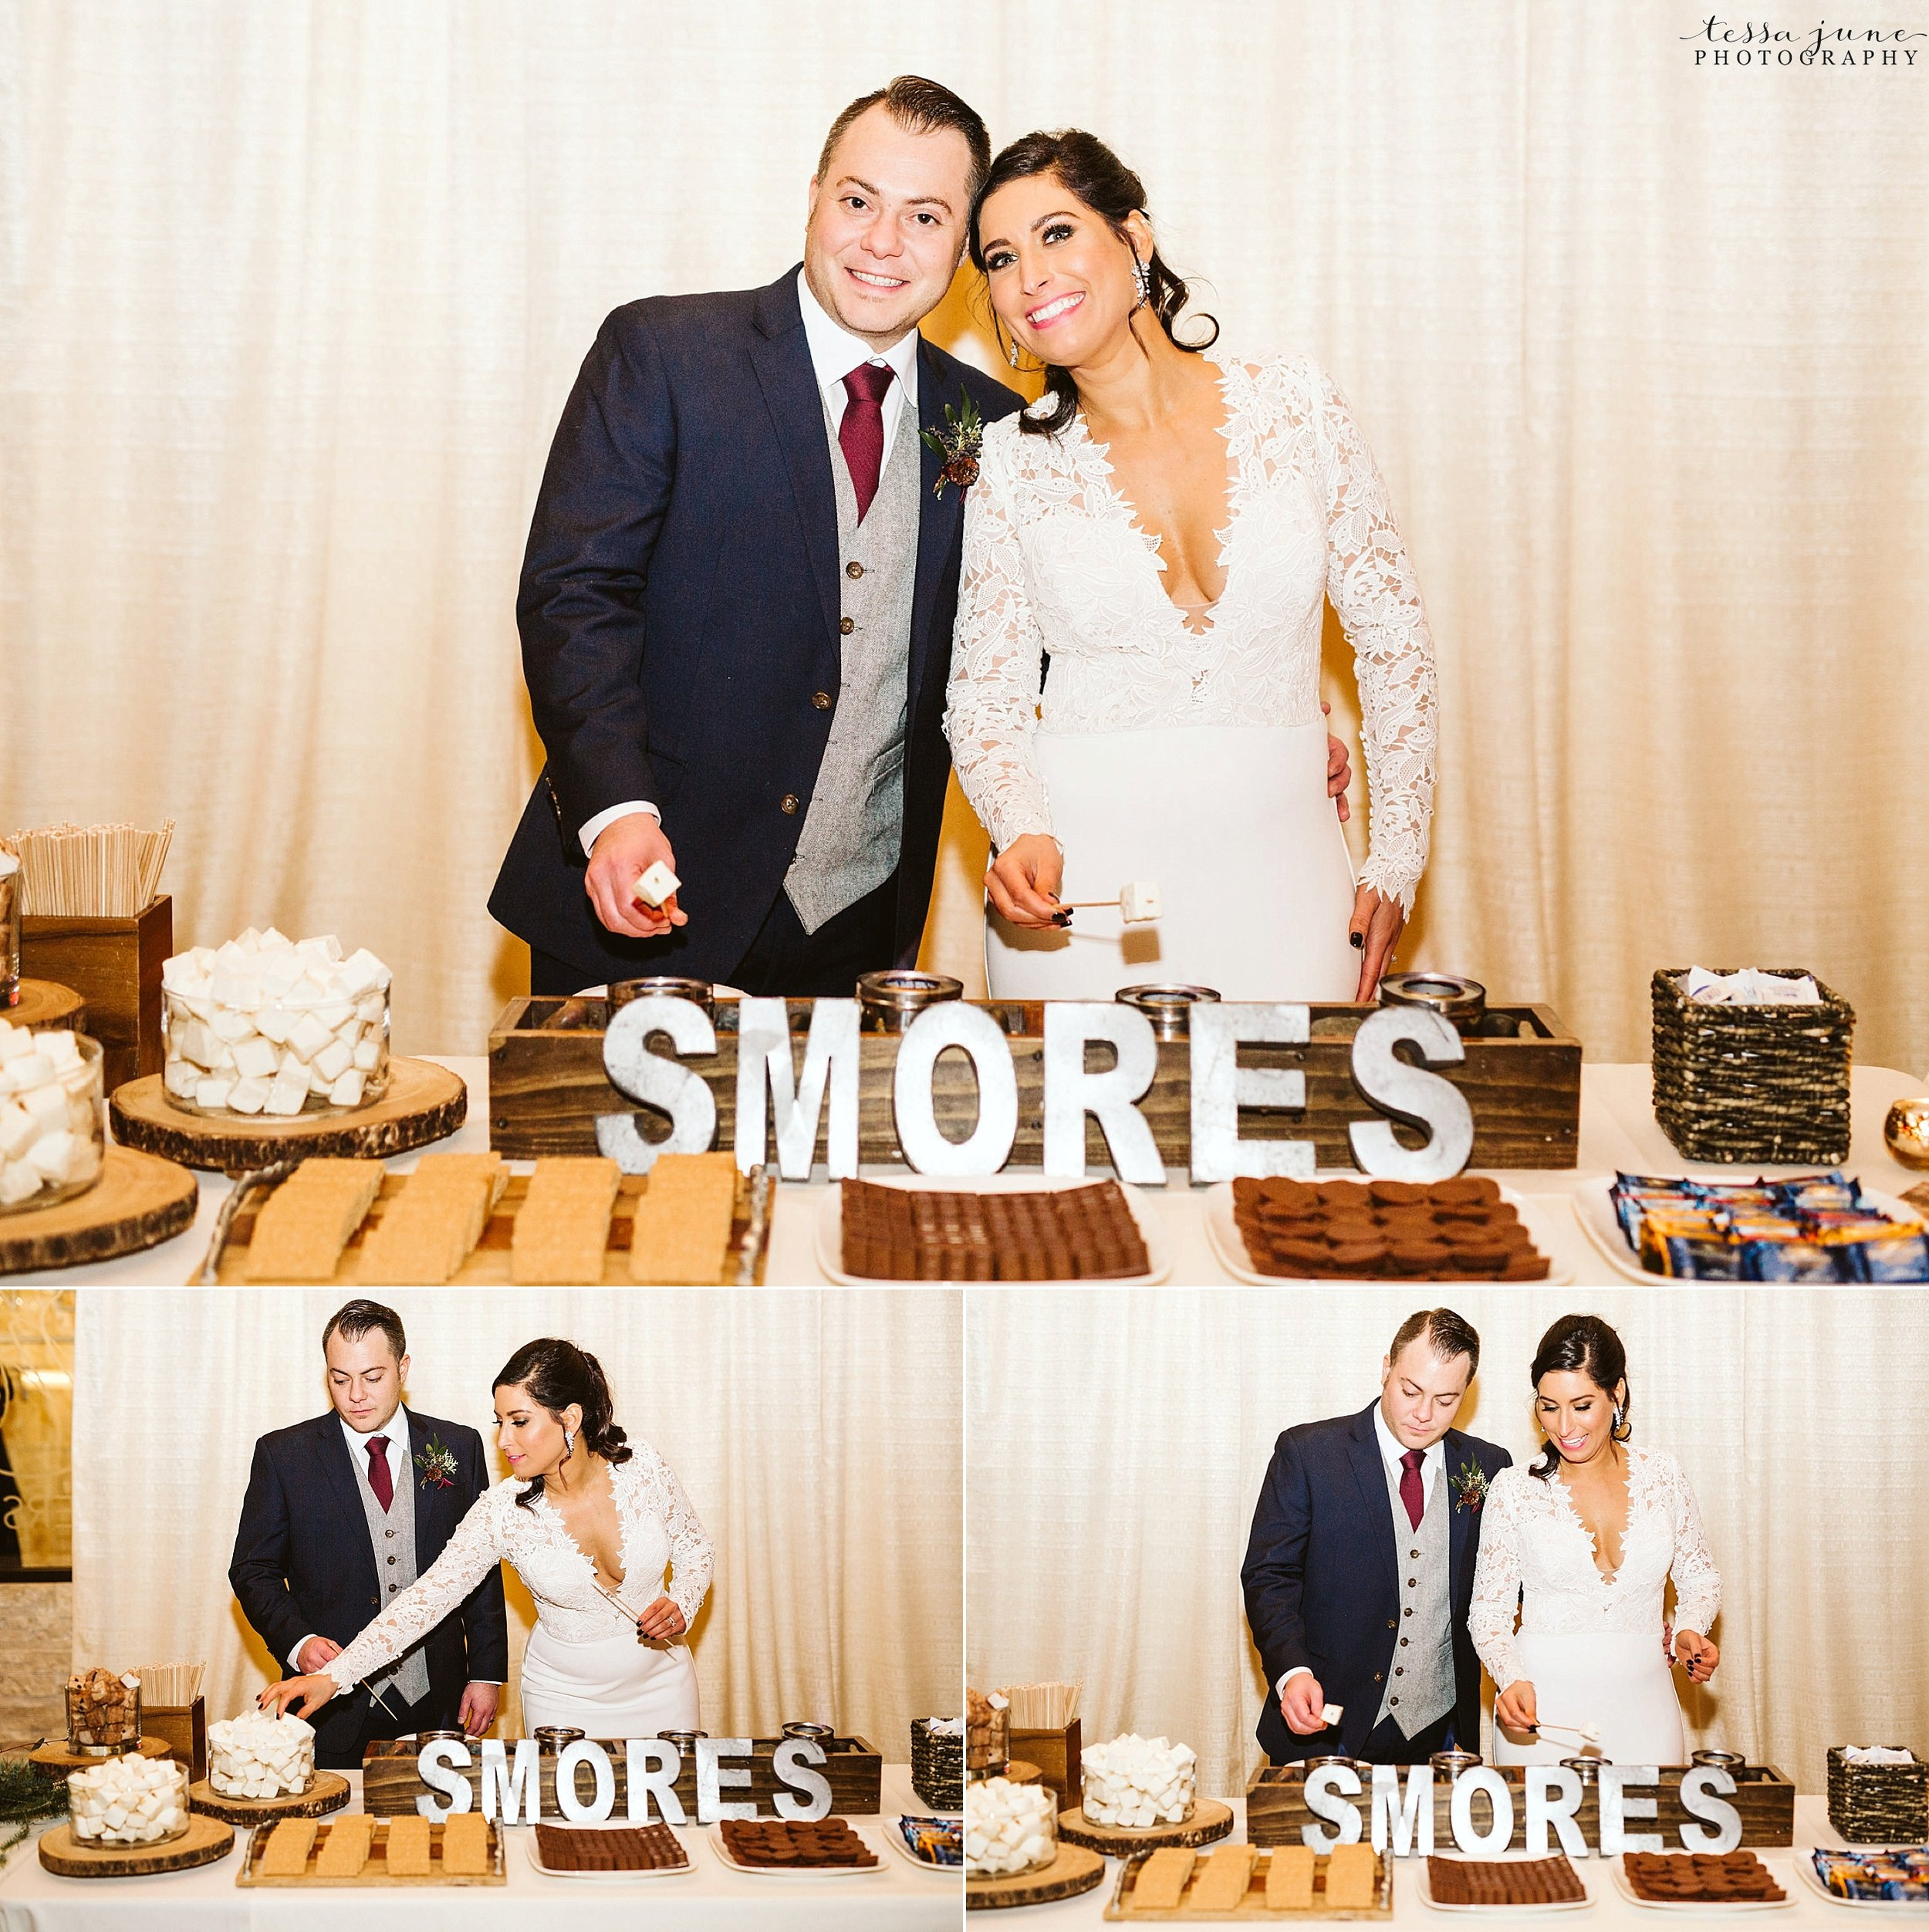 minneapolis-event-center-winter-romantic-snow-wedding-december-205.jpg